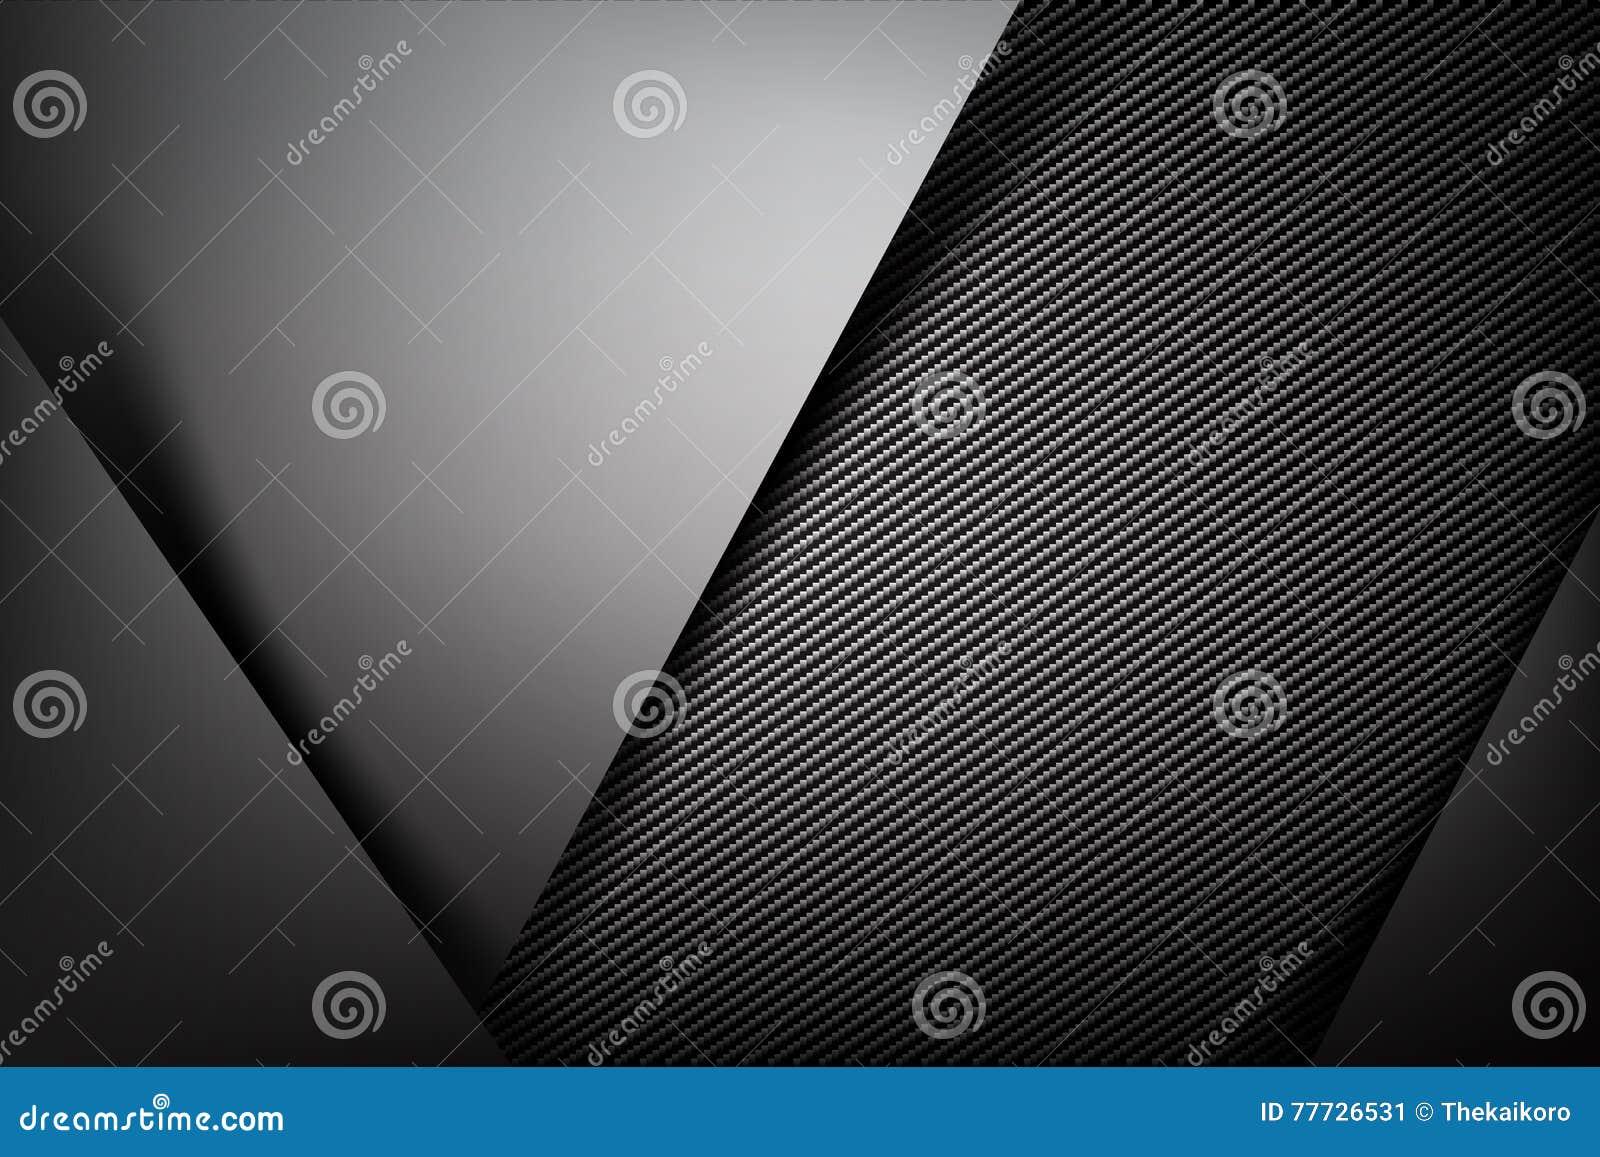 Oscuridad abstracta del fondo con el illust del vector de la textura de la fibra de carbono